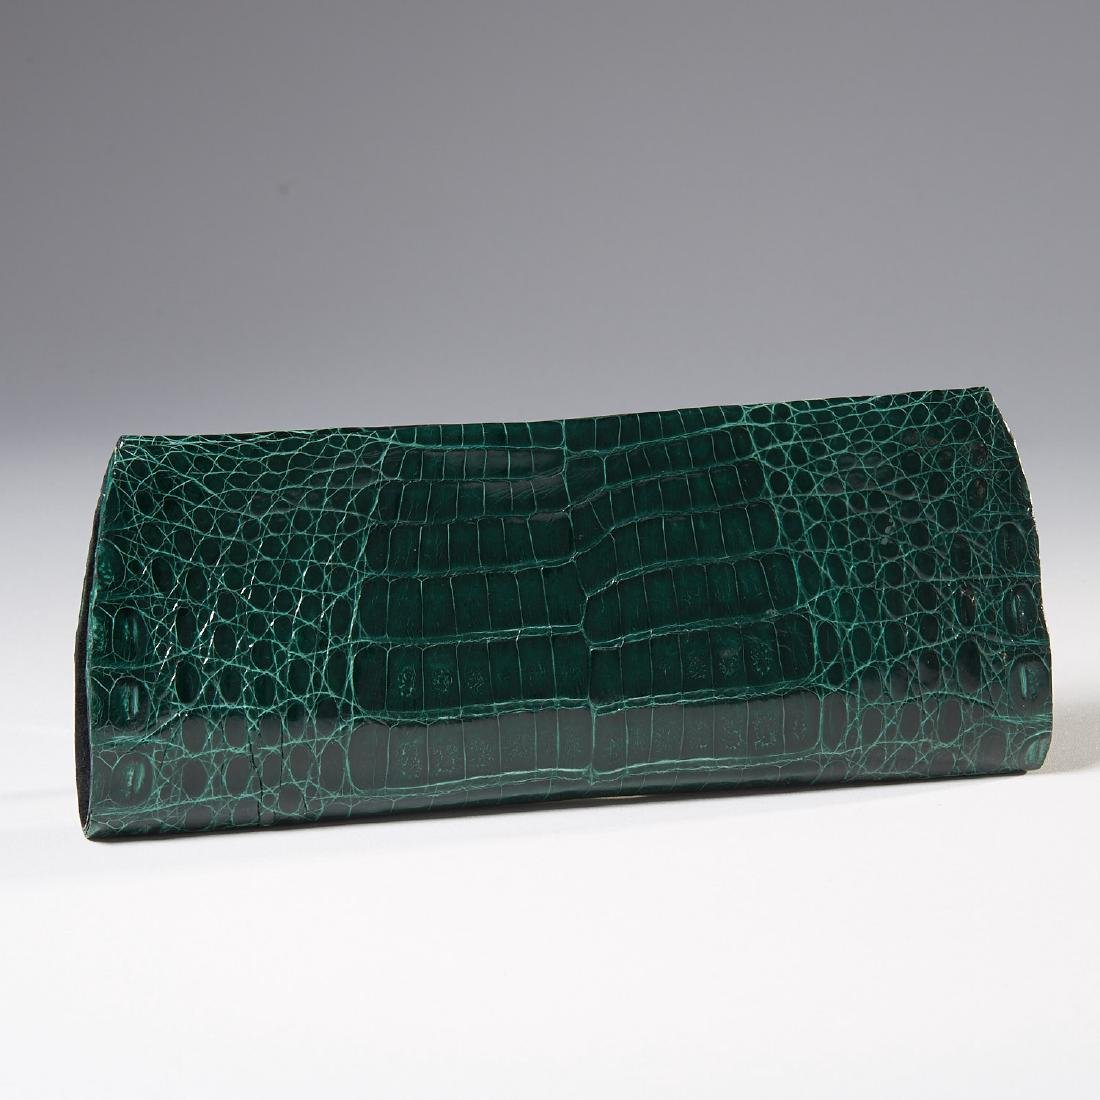 Gambelle green glazed crocodile clutch handbag - 3